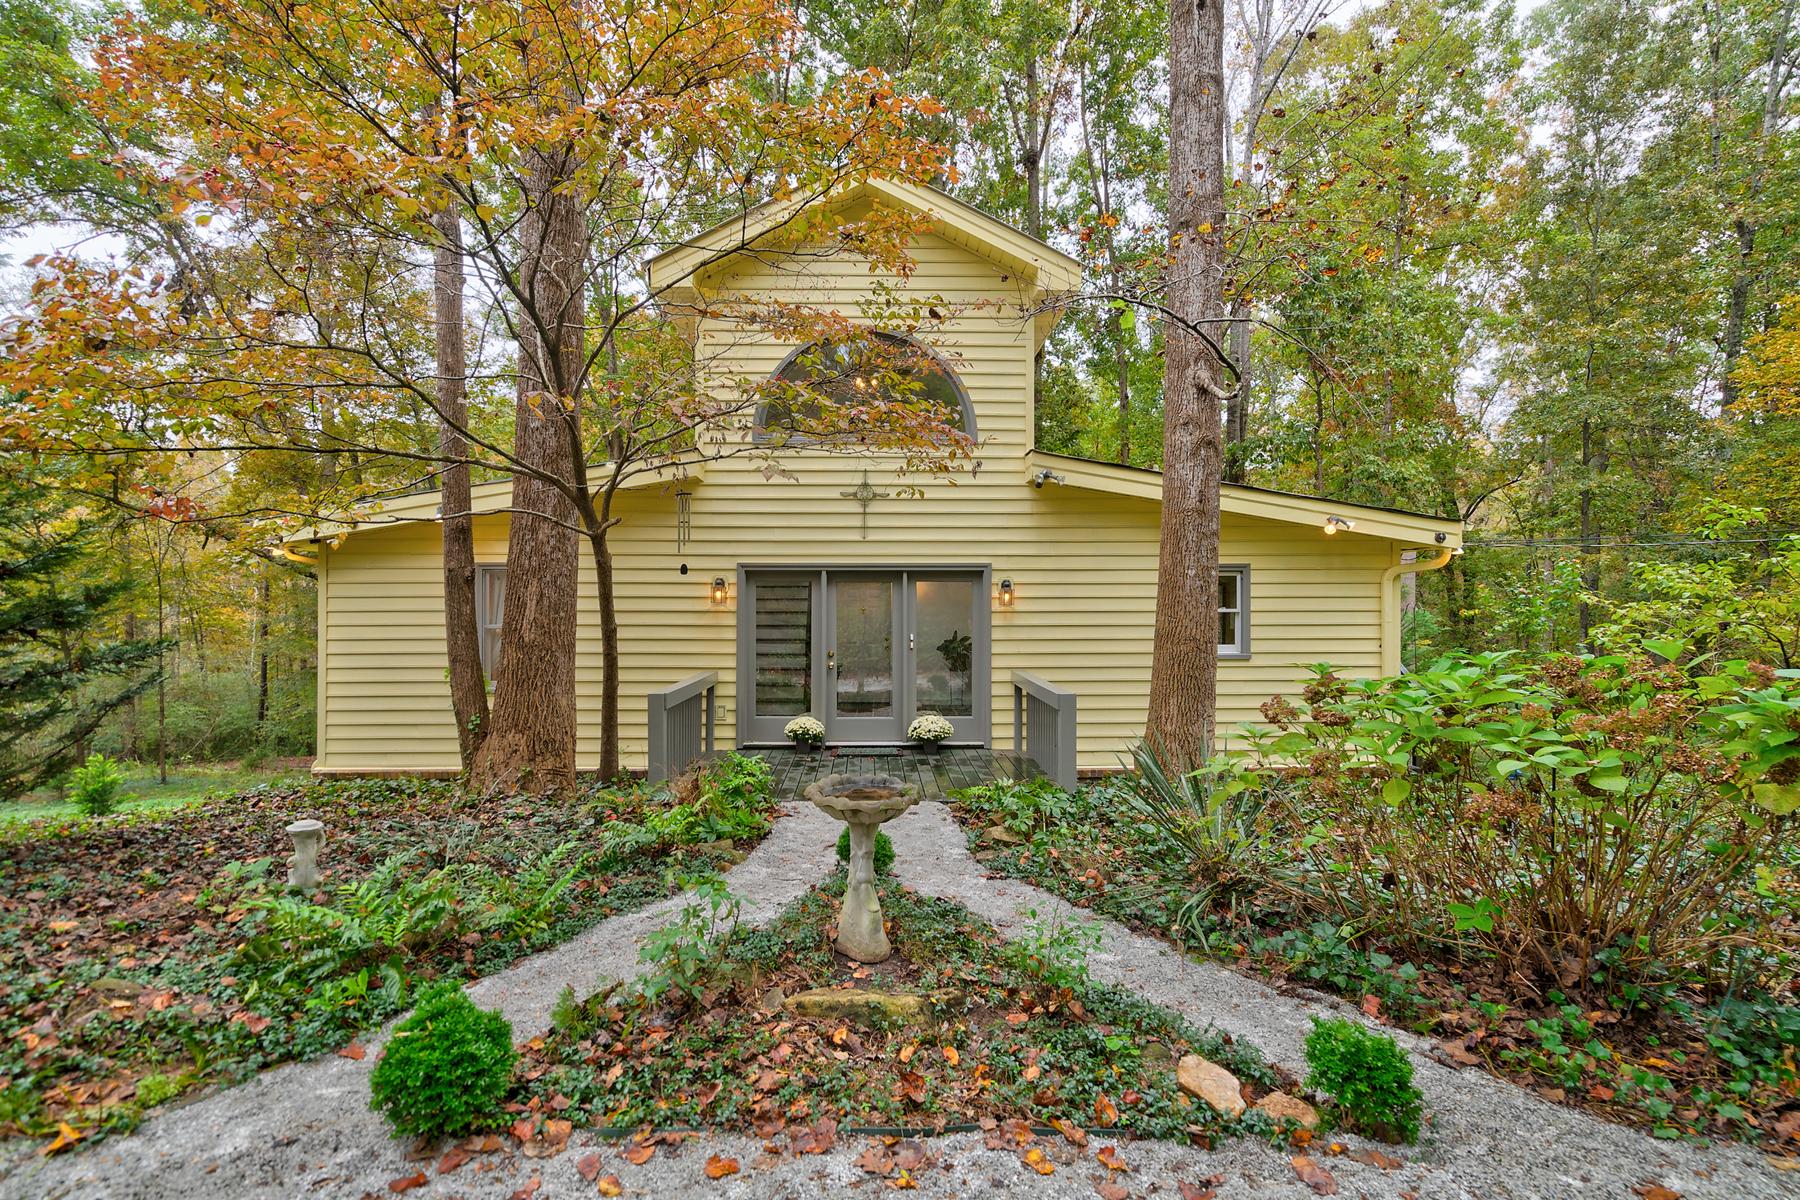 Single Family Home for Sale at 17+/- Acre Idyllic Setting Horse Farm 3255 Daniels Bridge Road SW Conyers, Georgia 30094 United States